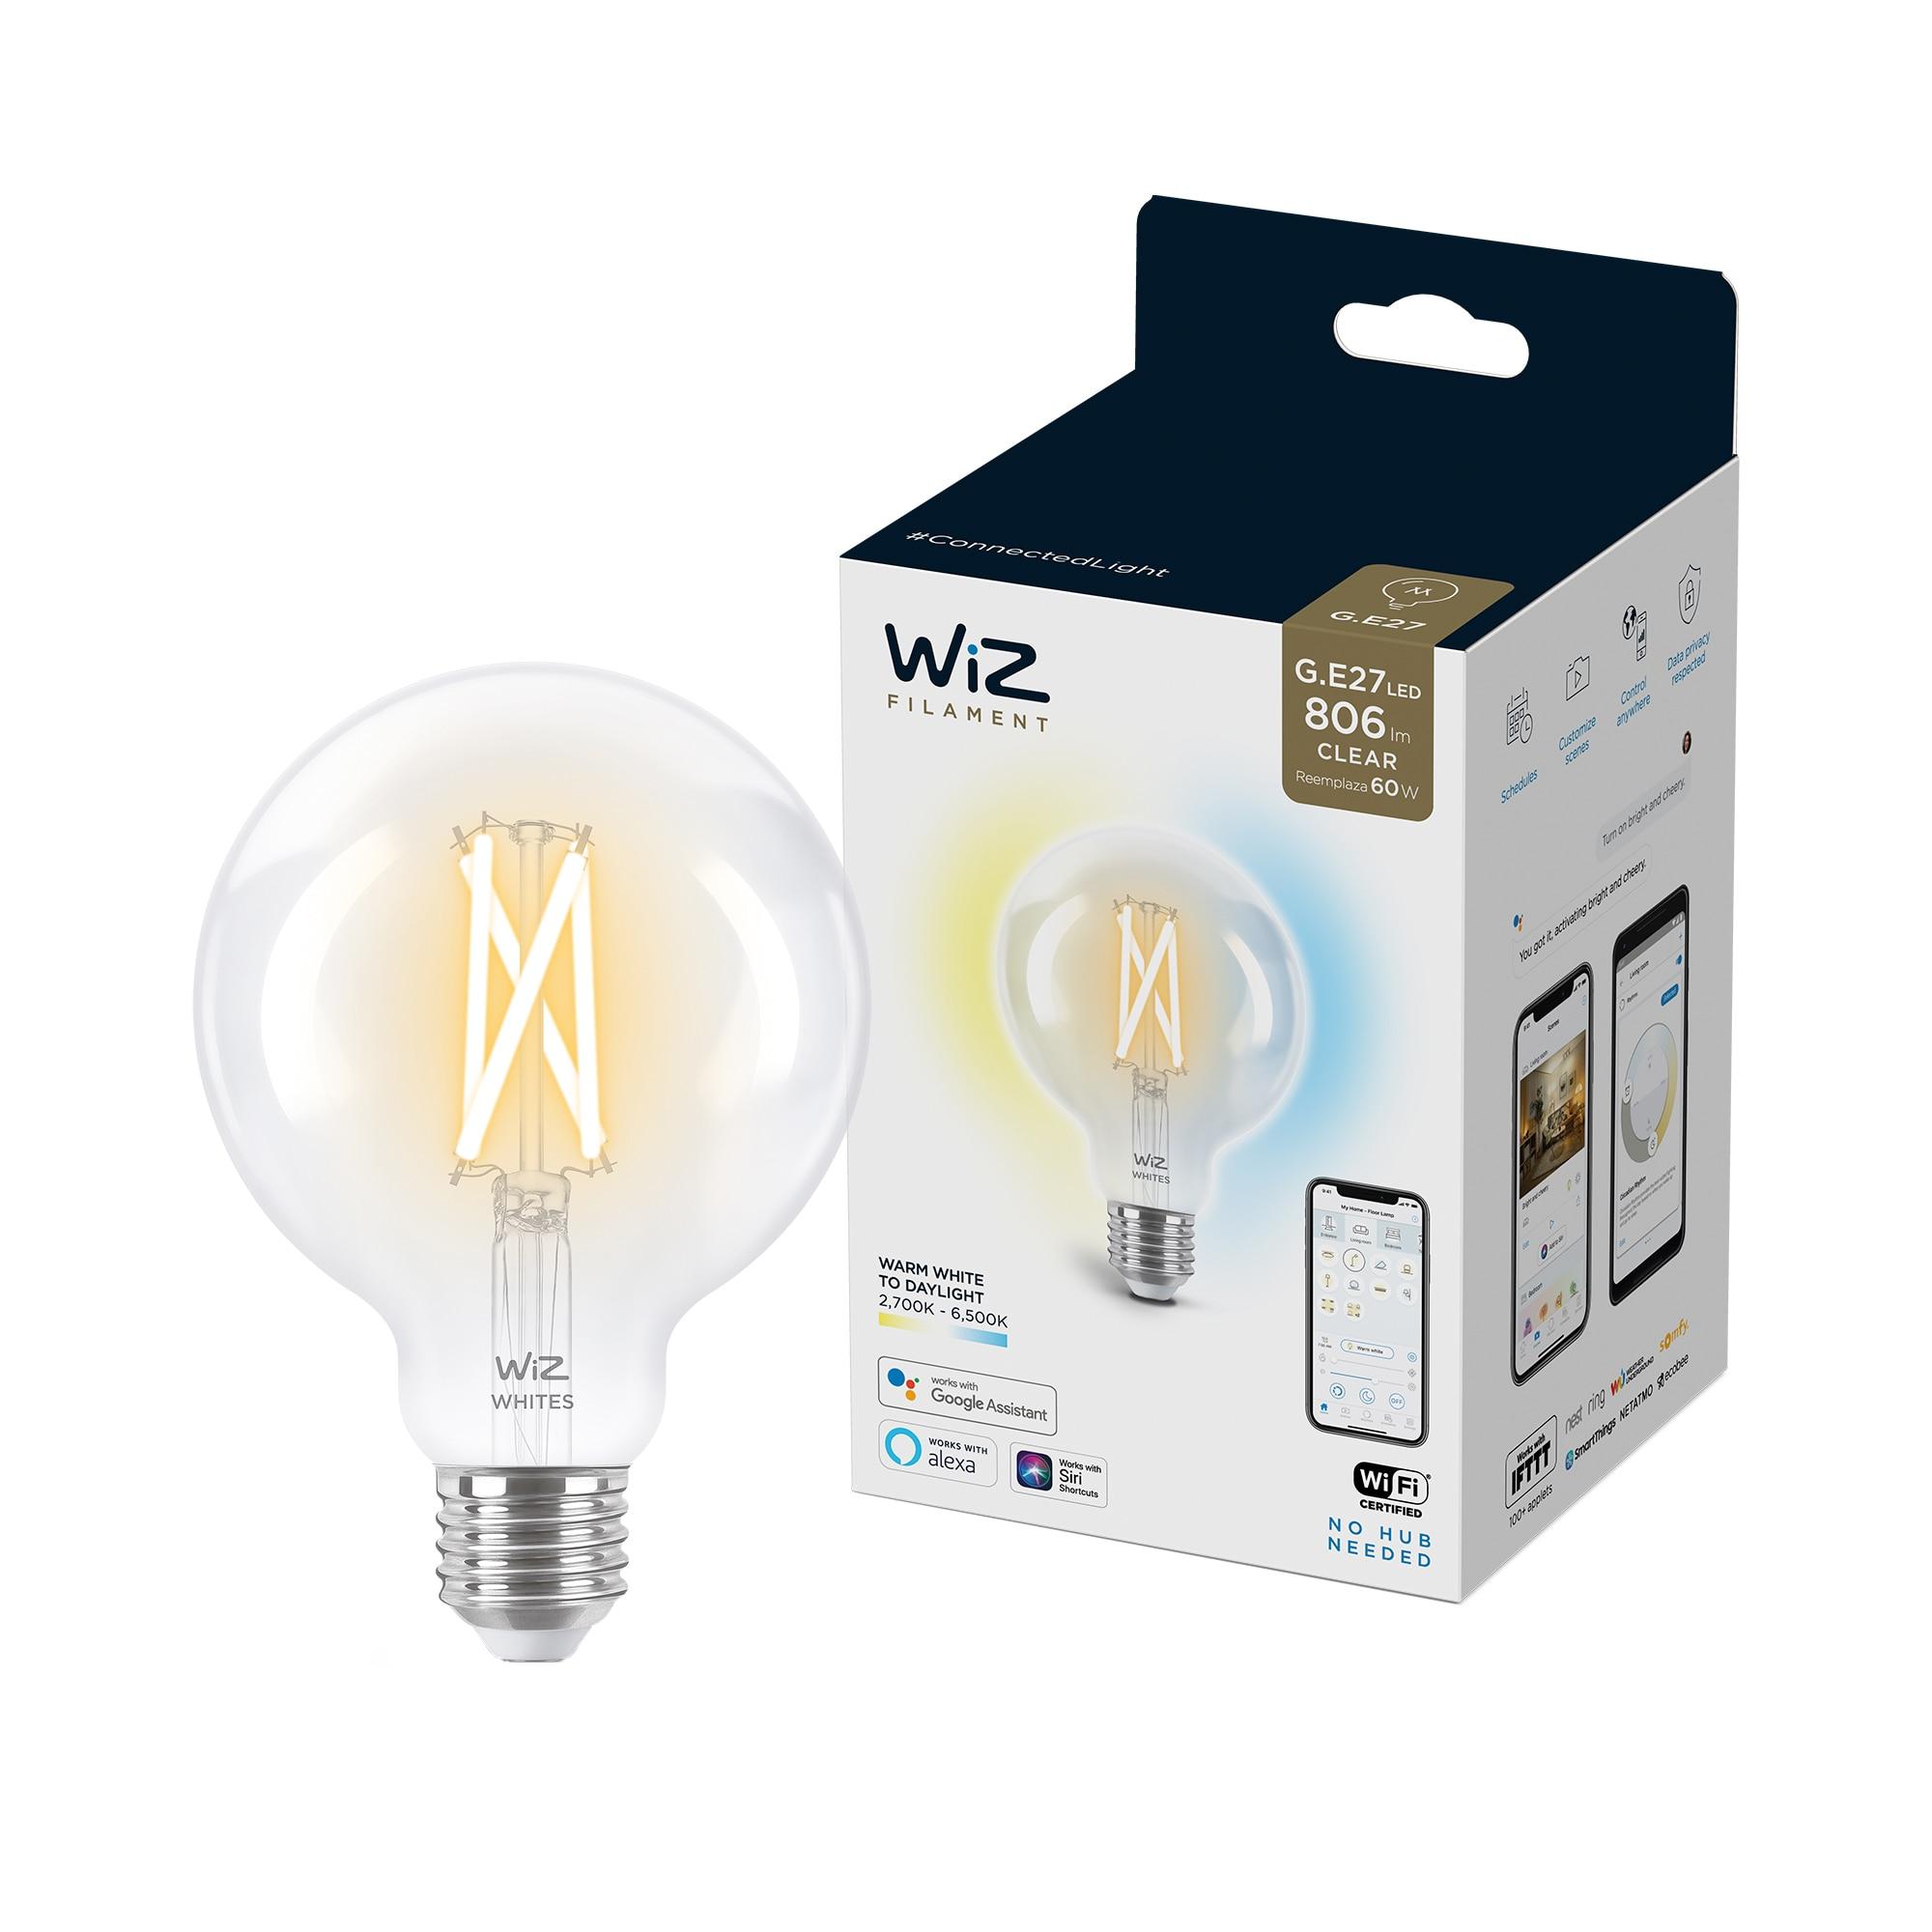 Fotografie Bec LED inteligent vintage WiZ Filament Whites, Wi-Fi, G95, E27, 6.7W (60W), 806 lm, temperatura lumina reglabila (2700K-6500K), compatibil Google Assistant/Alexa/Siri